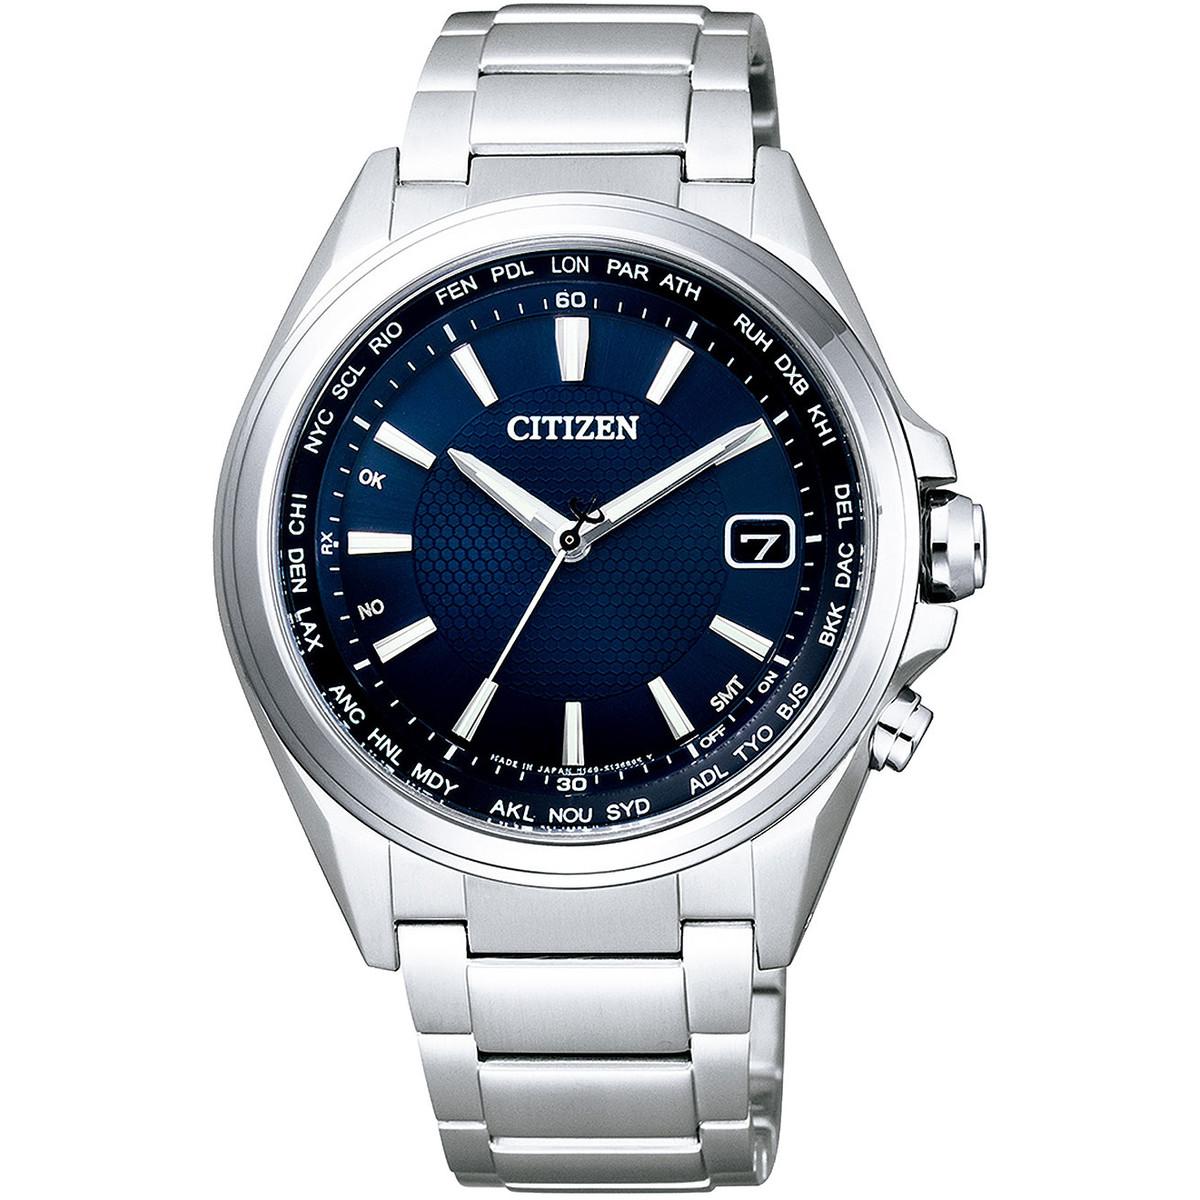 Ceas barbatesc Citizen Eco Drive-CB1070-56L Titanium de mana original